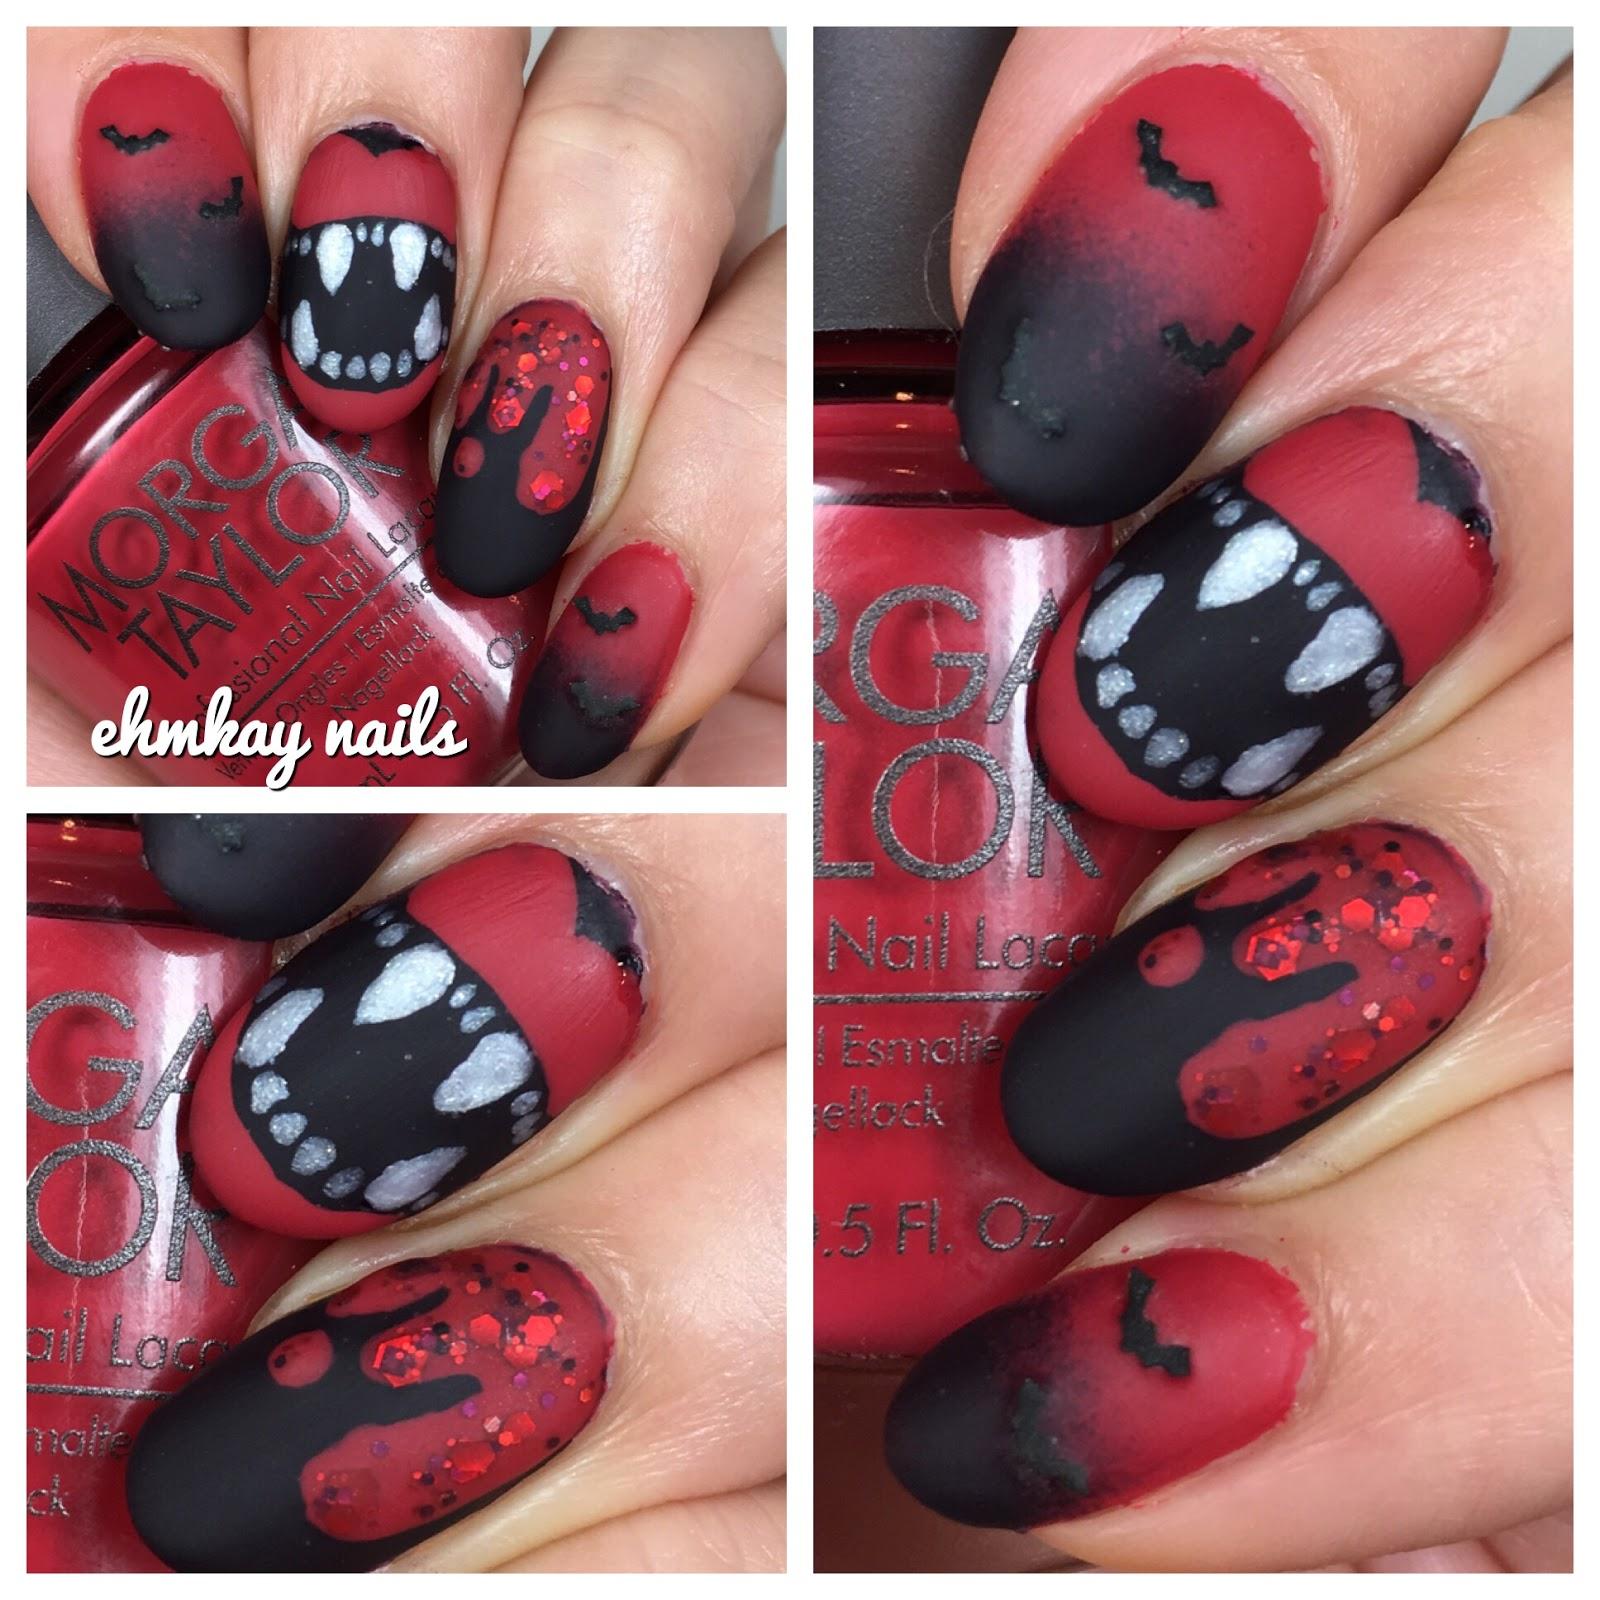 ehmkay nails: 13 Days of Halloween Nail Art: Vampire Nail Art with ...